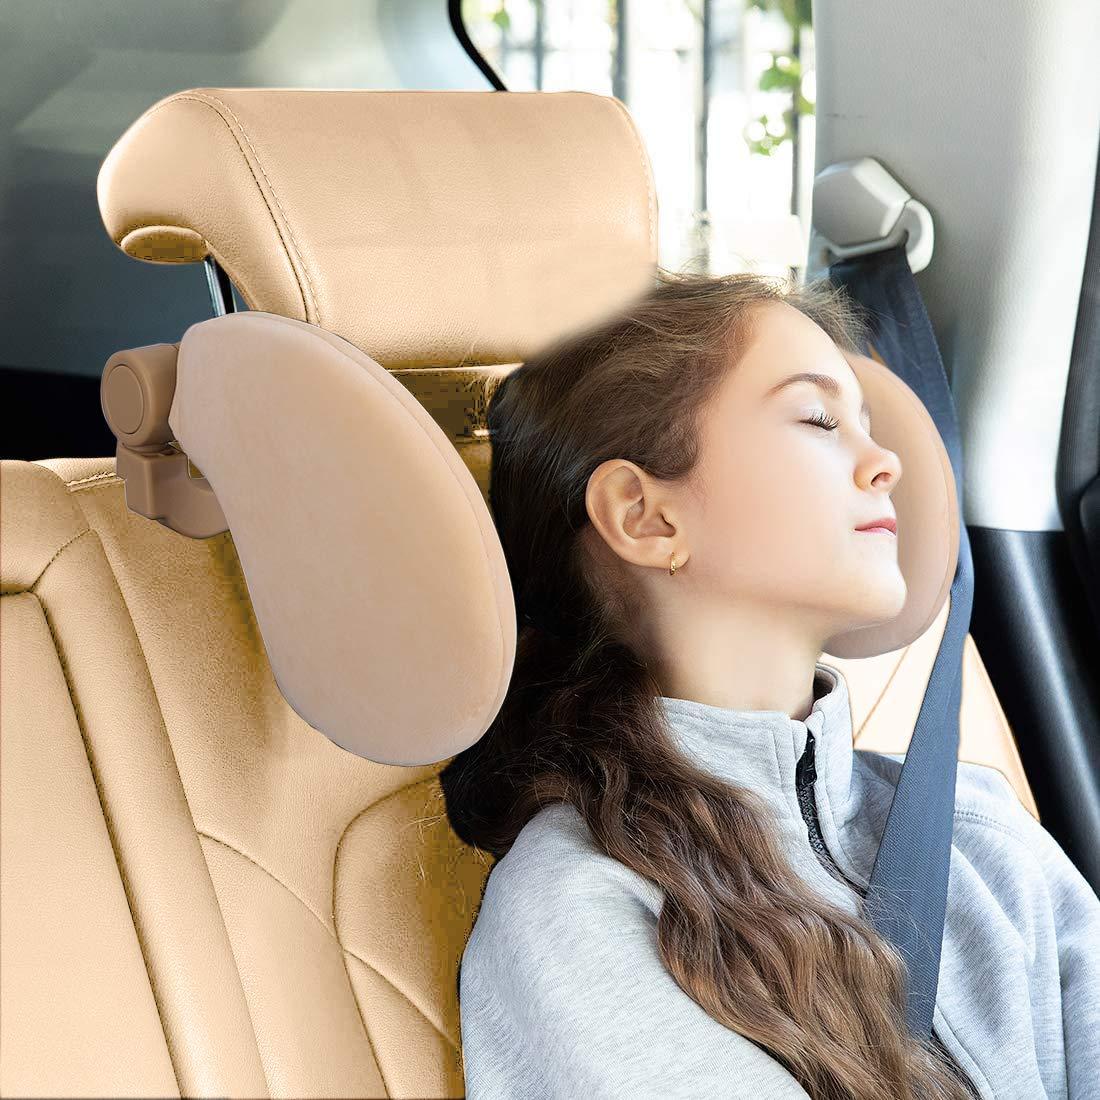 U-shaped Design Car Seat Pillow Headrest Neck Support Head Restraint Travel Sleeping Cushion with Memory Foam for Adult Kids Coriver PU Car Headrest Cushion